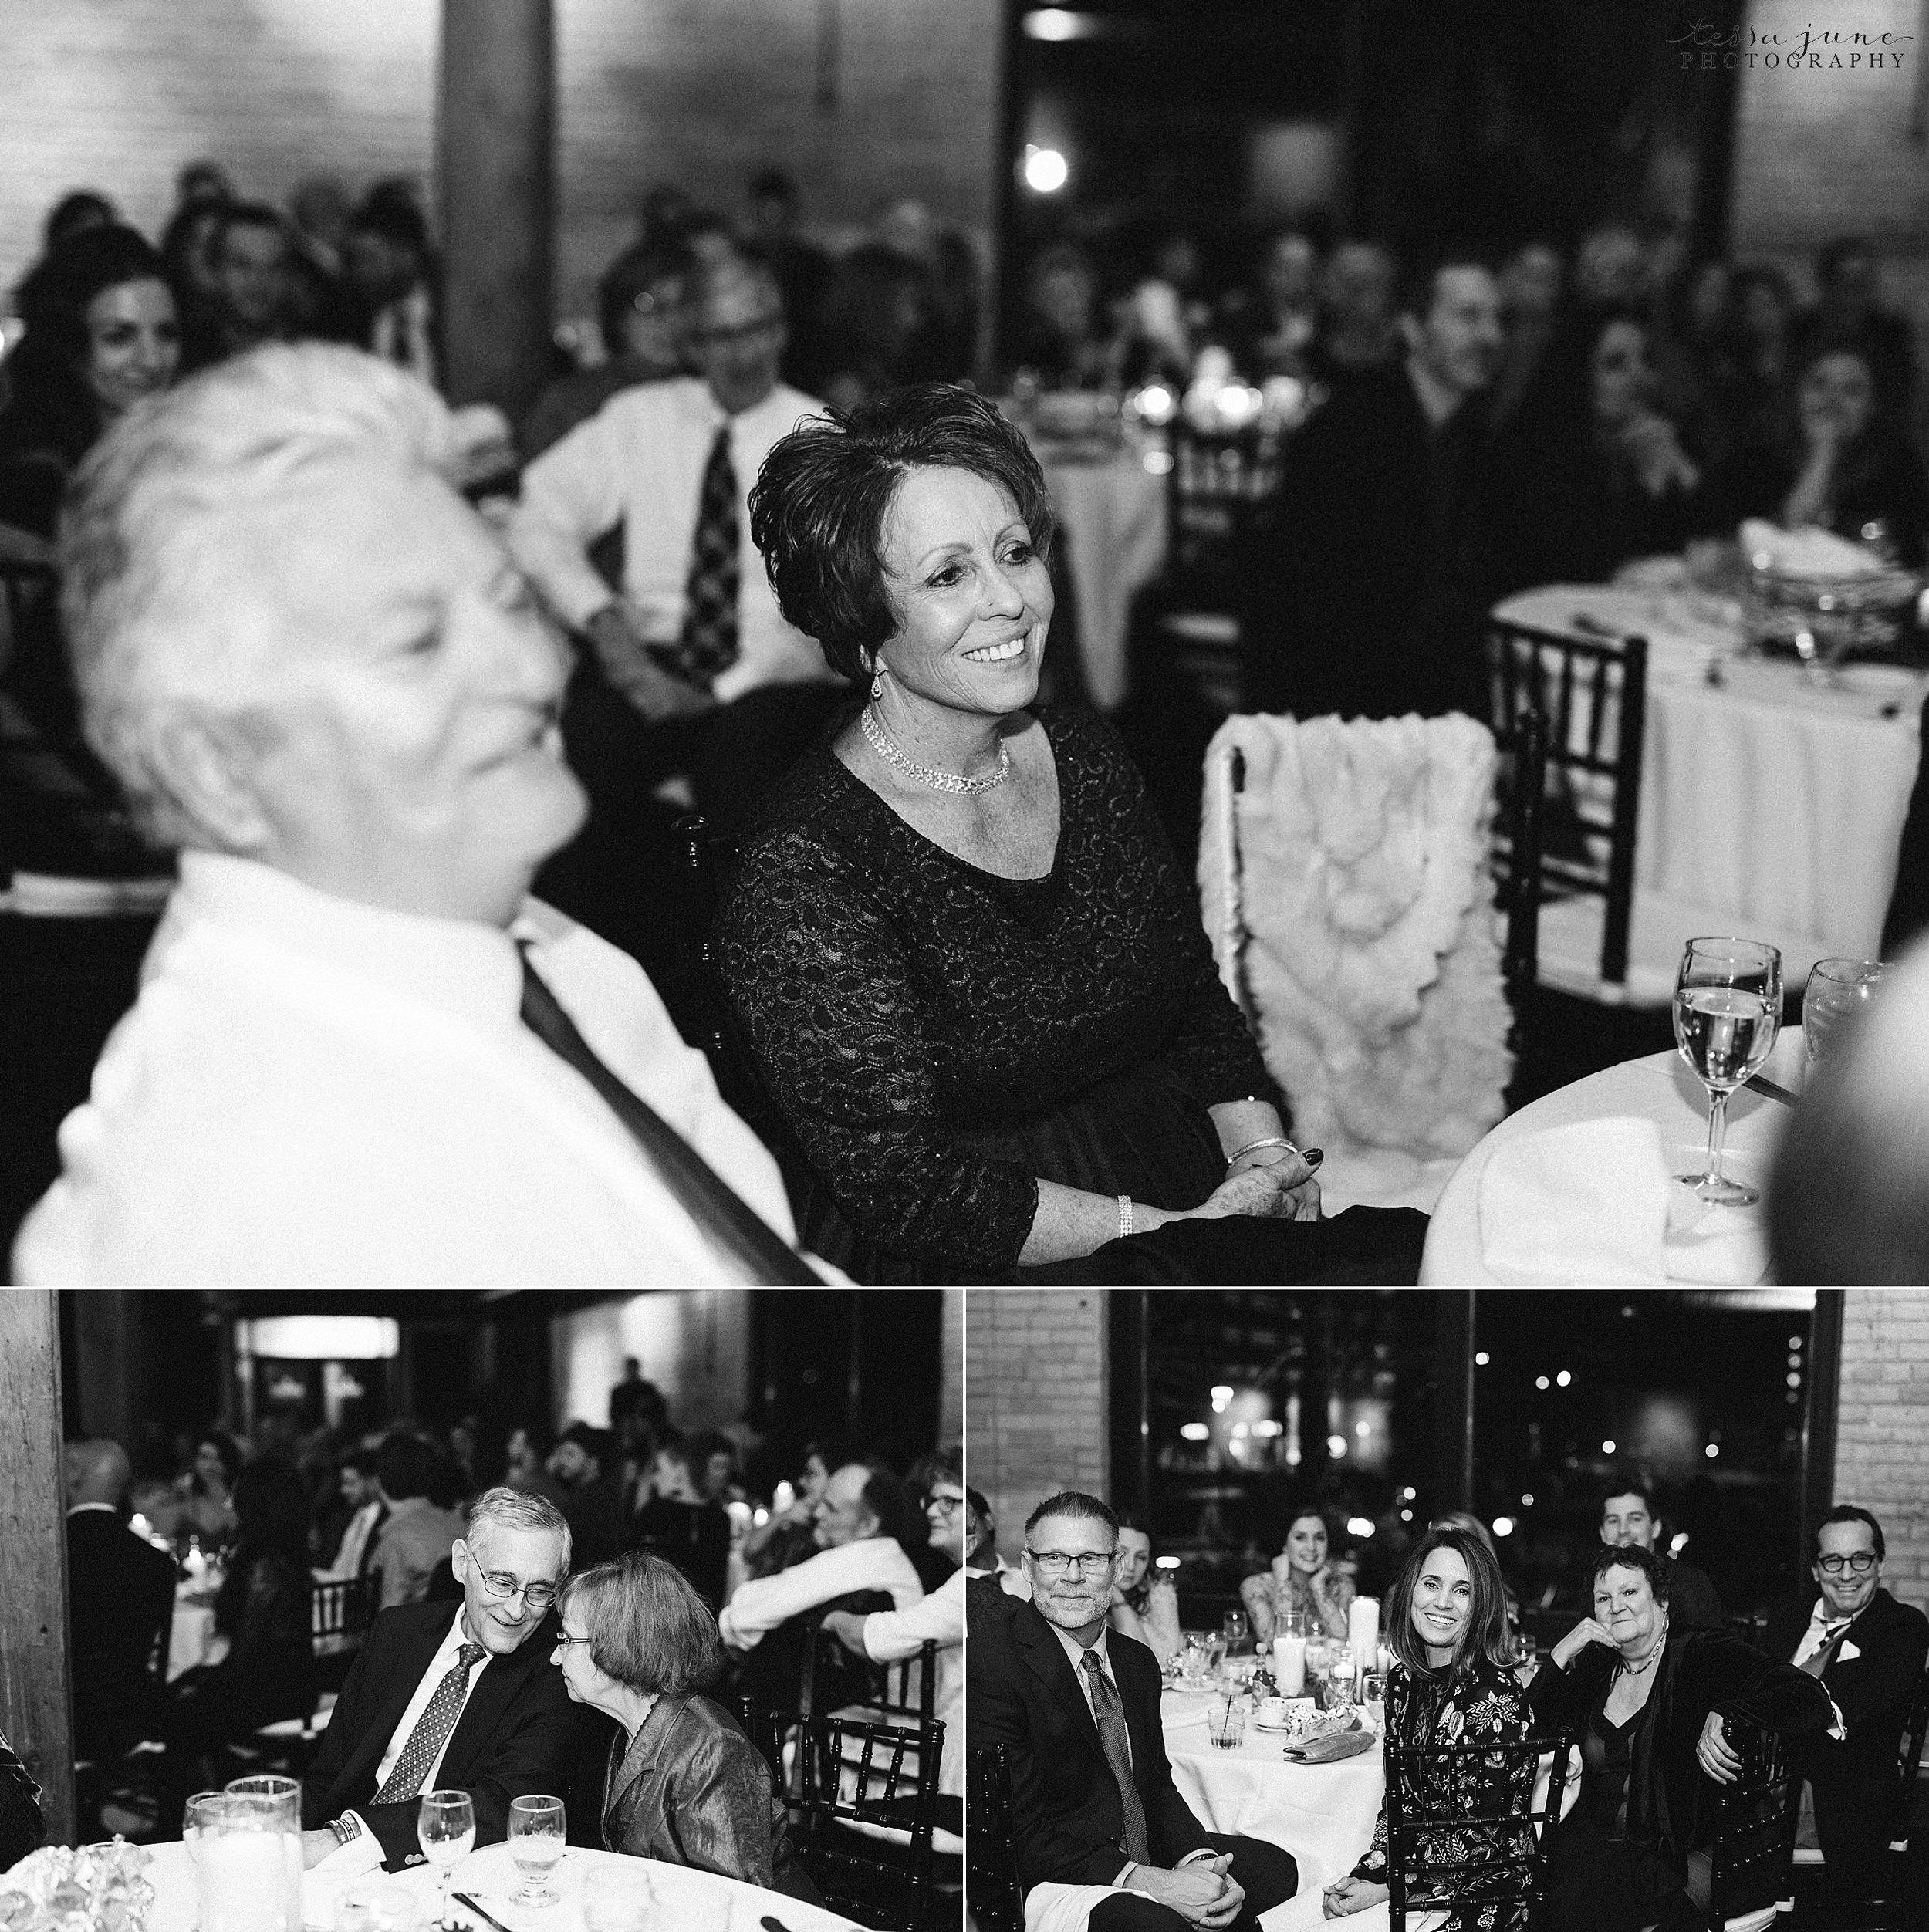 minneapolis-event-center-winter-romantic-snow-wedding-december-193.jpg